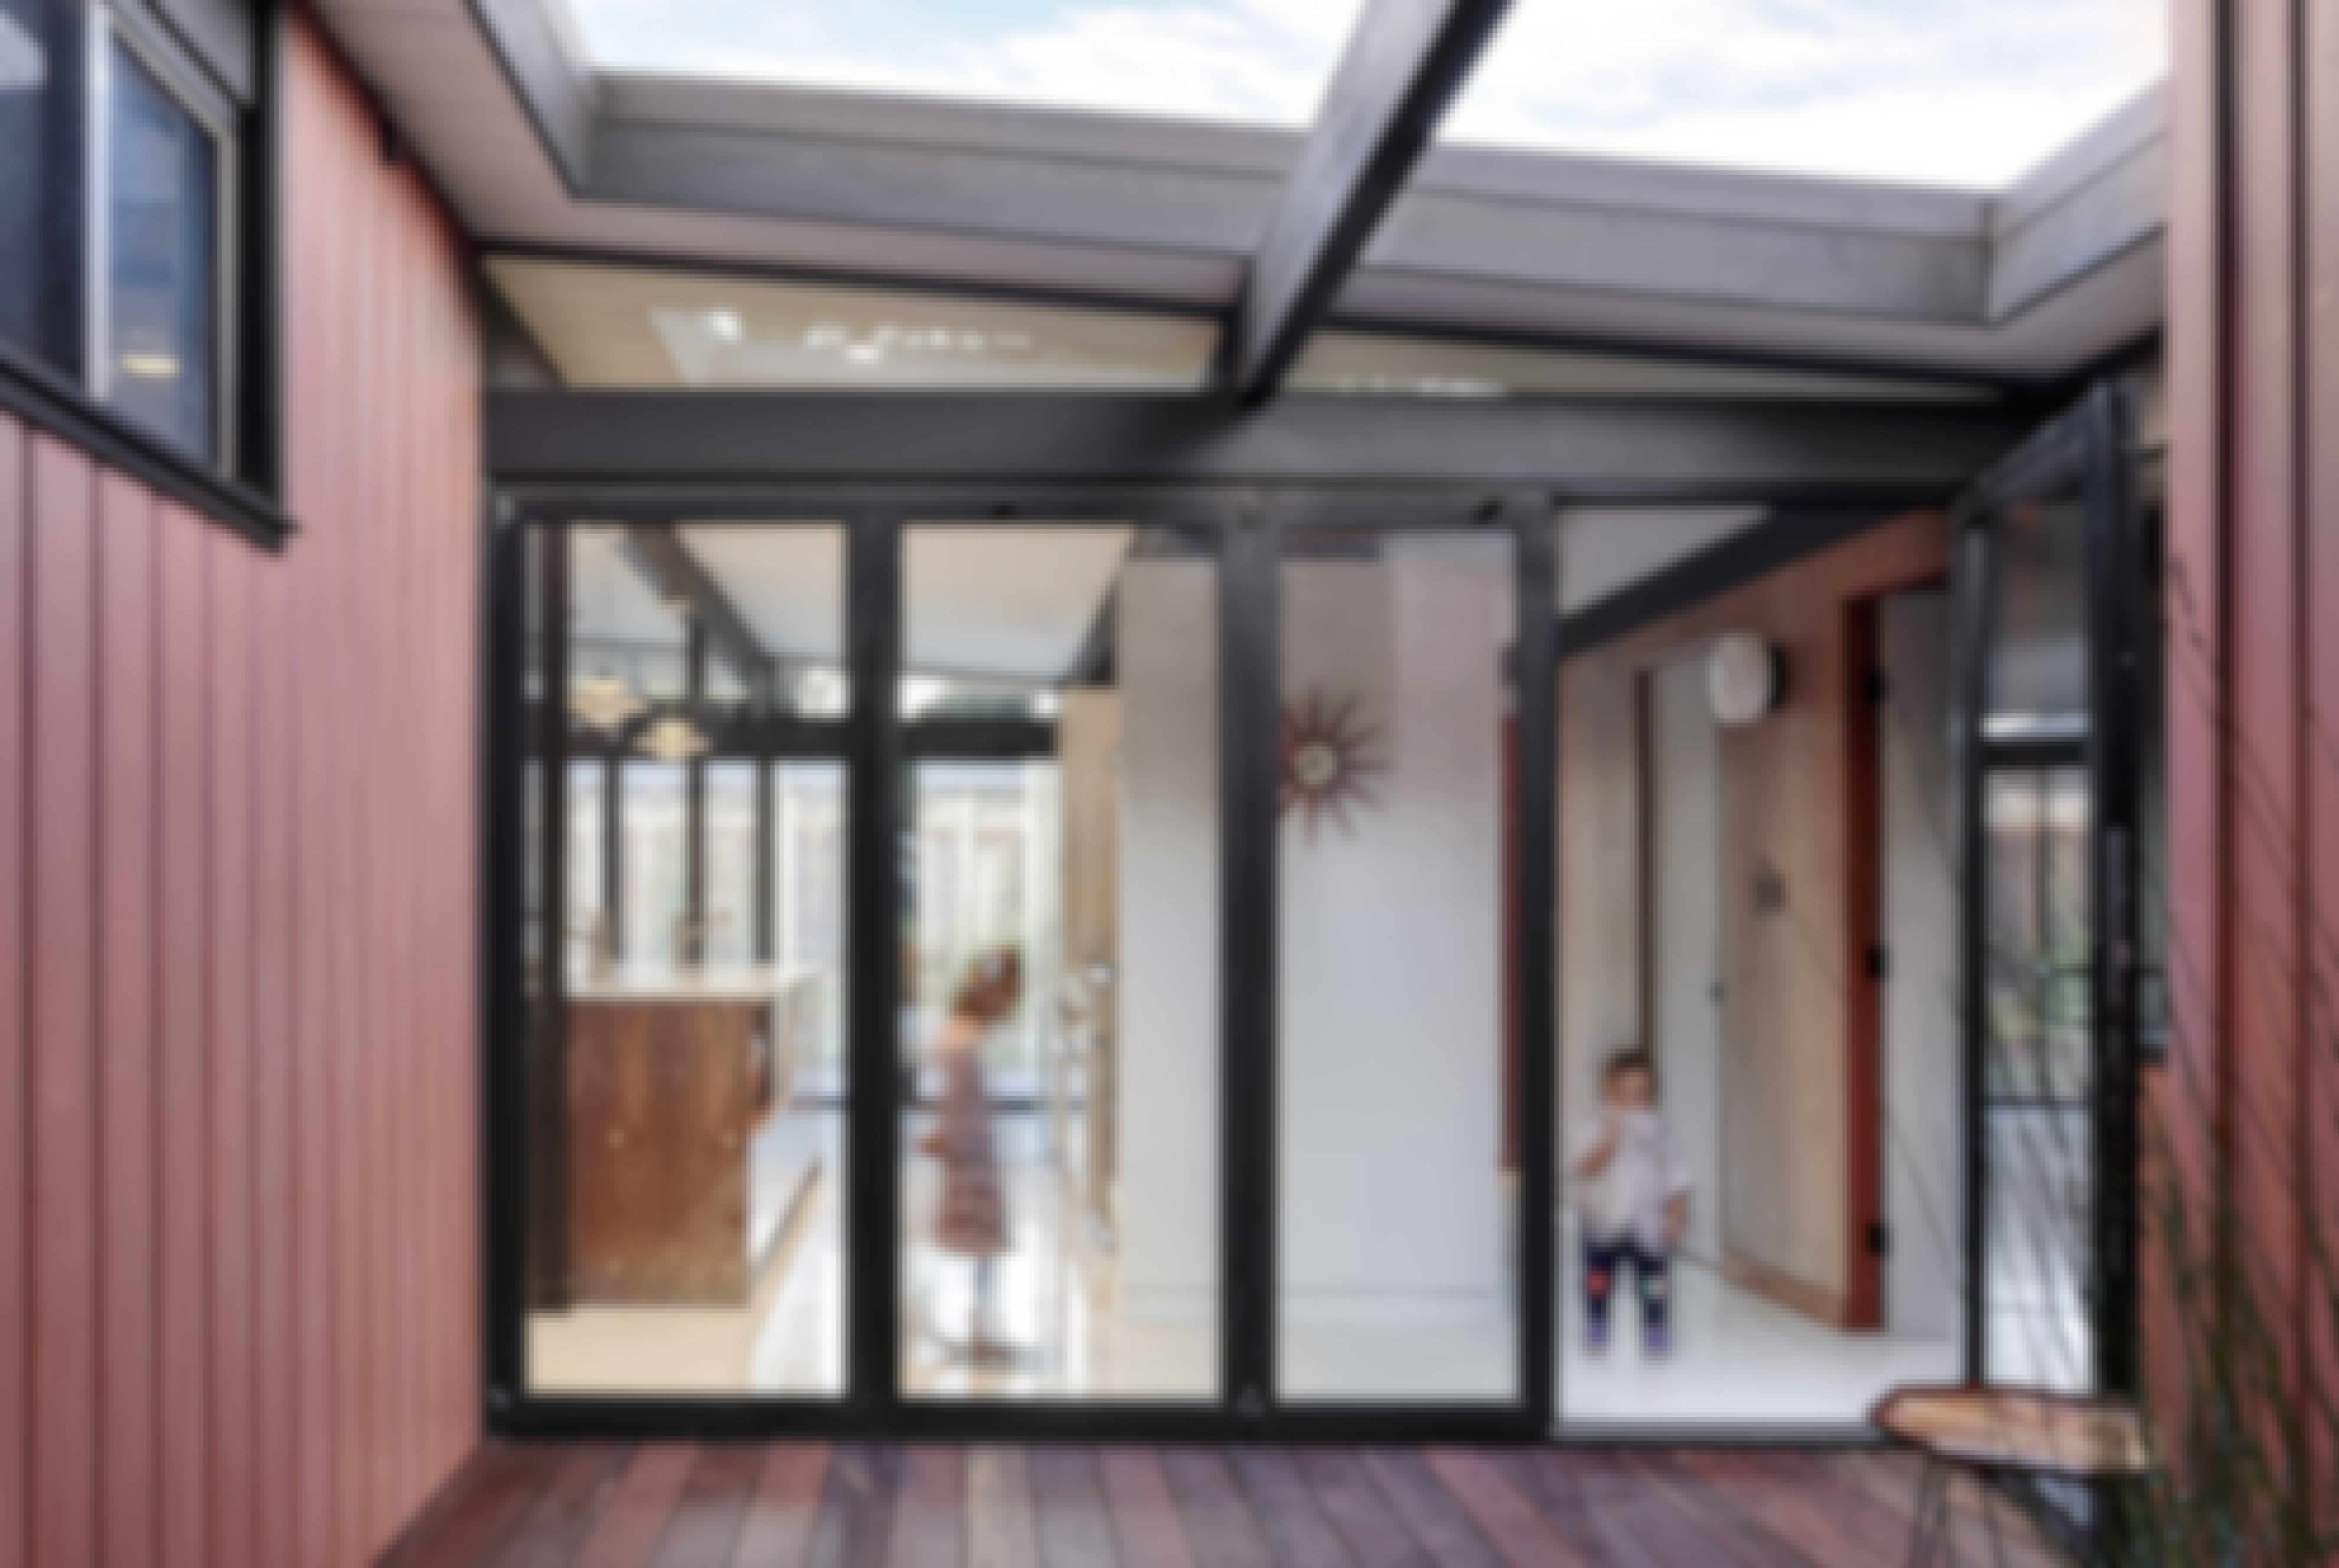 kids-behind-opening-glass-walls